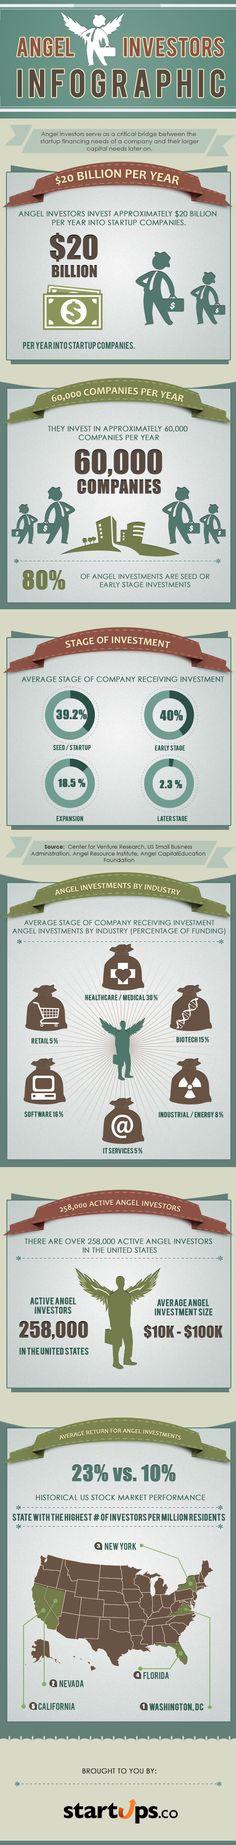 Angel investors put $20B a year into startups (infographic) | VentureBeat